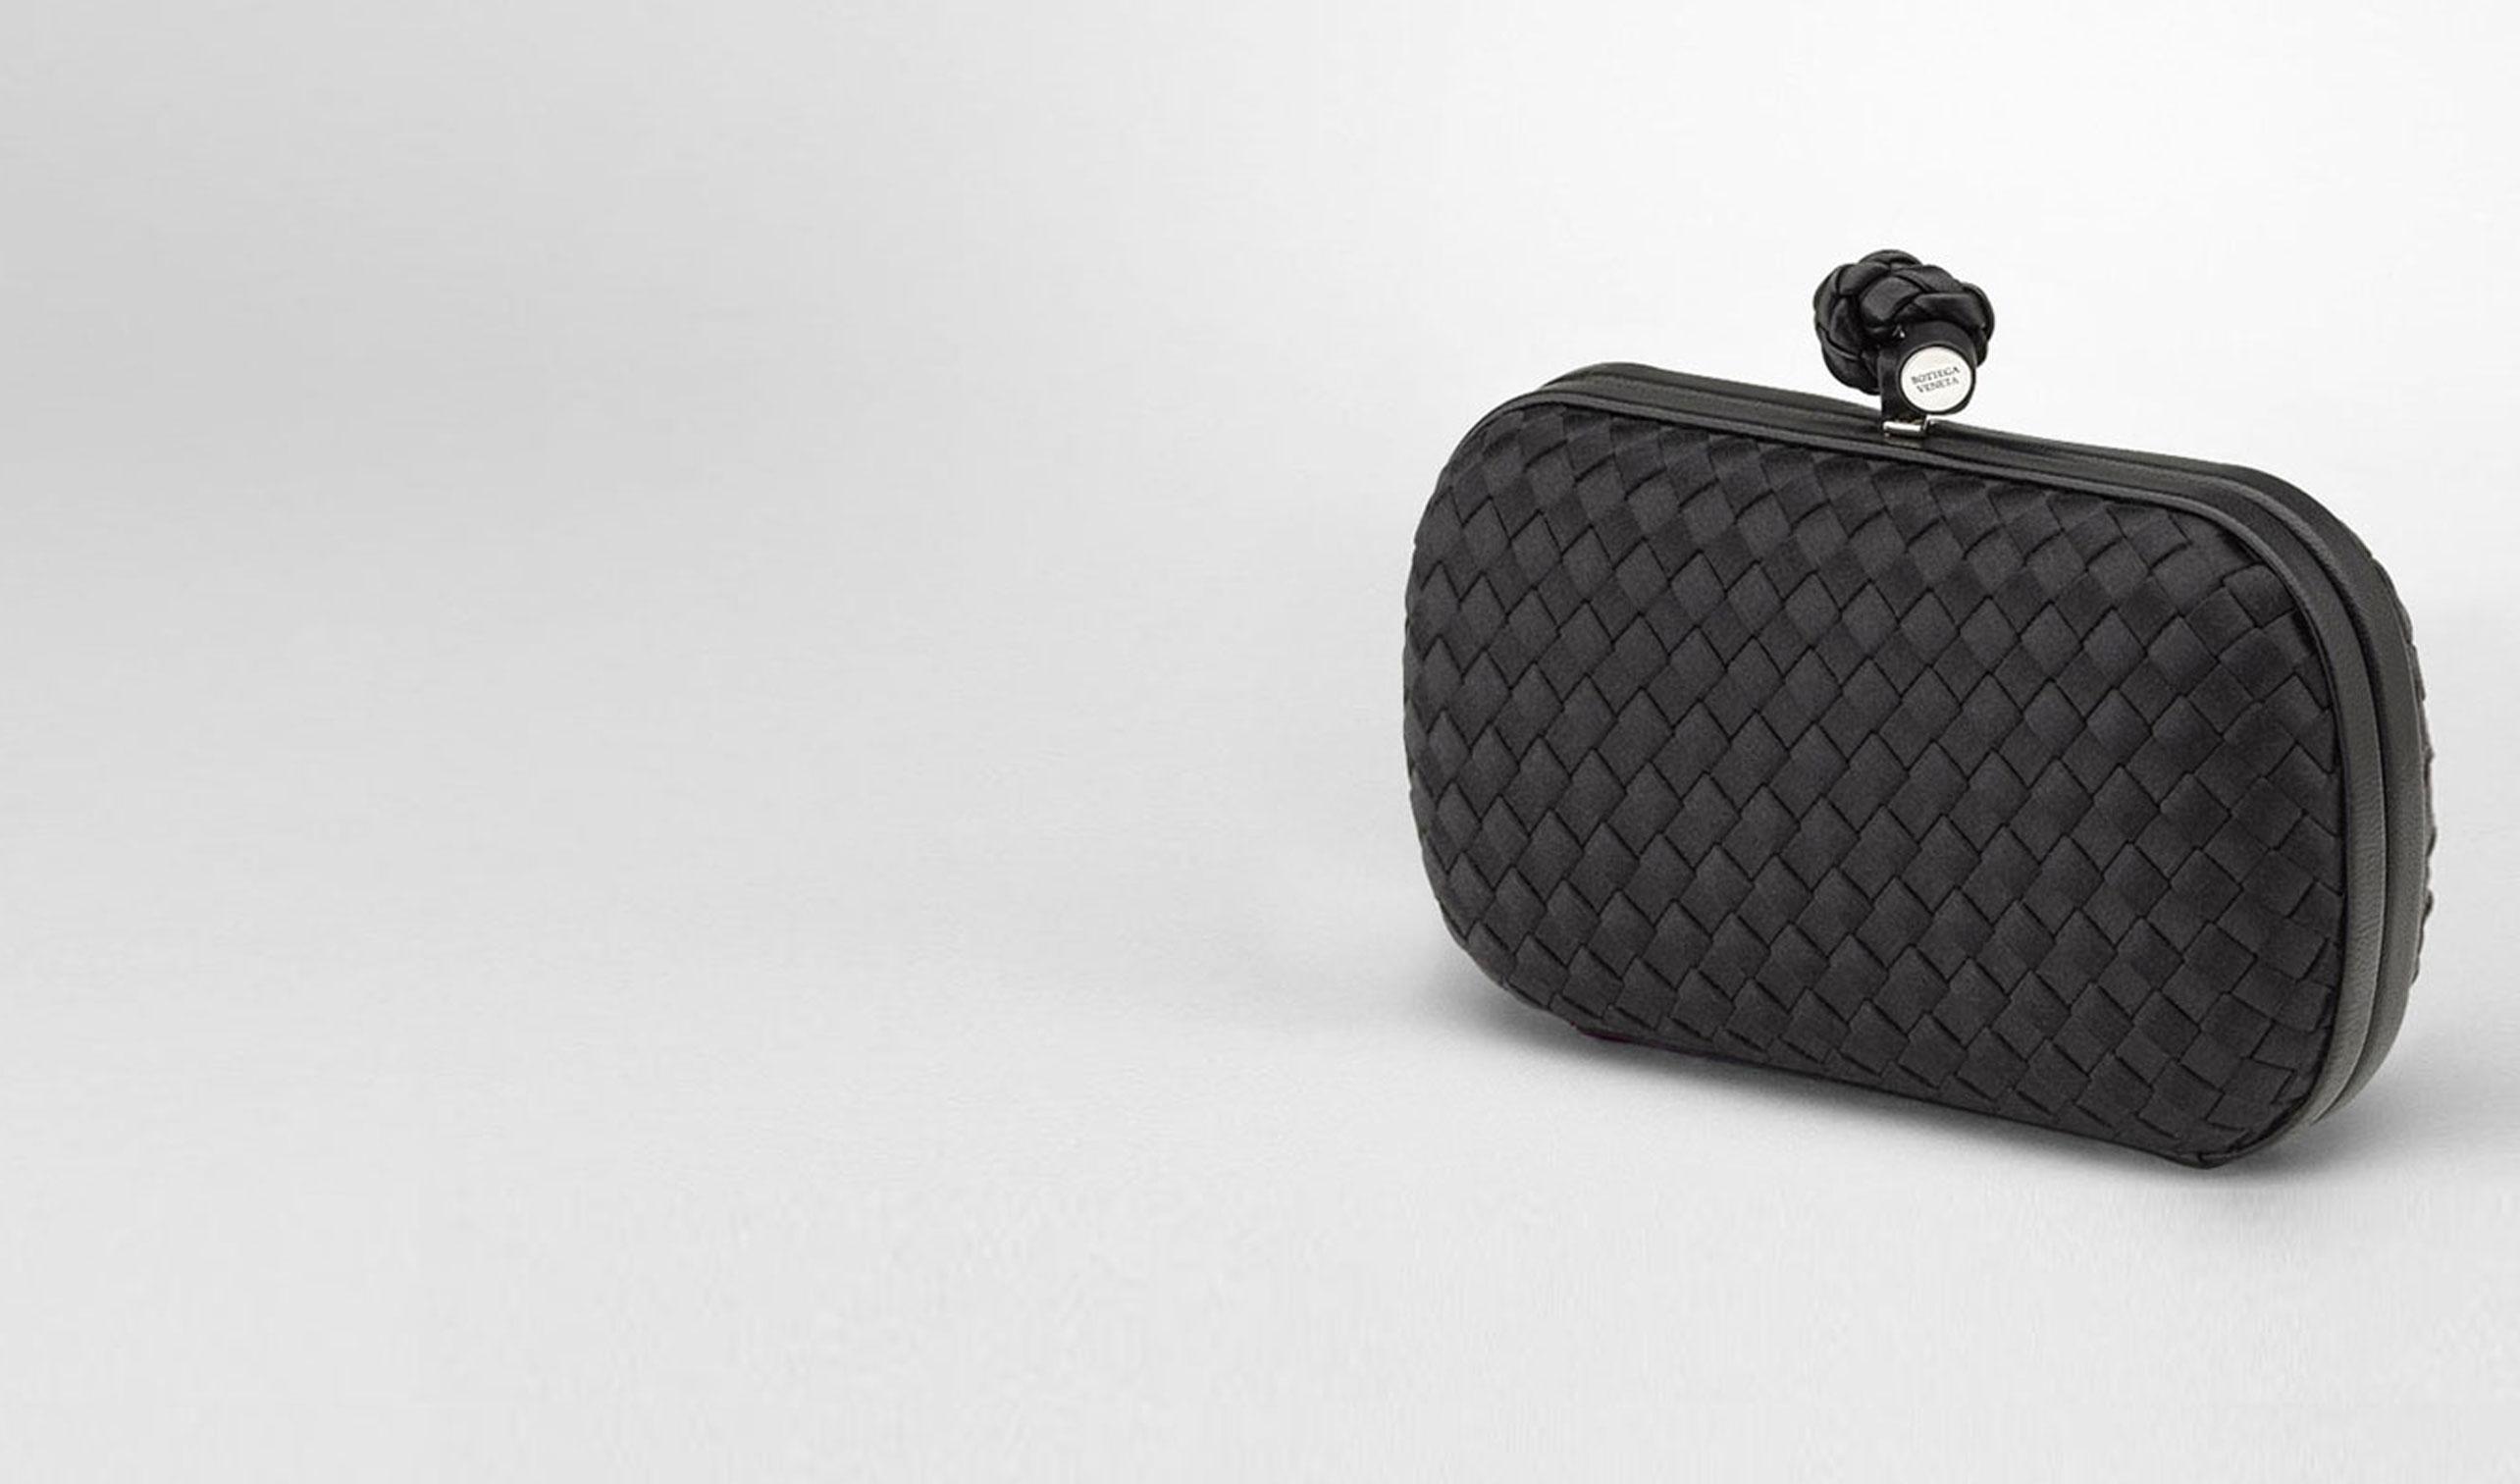 bottega veneta top knot clutch bottega veneta wallet online. Black Bedroom Furniture Sets. Home Design Ideas